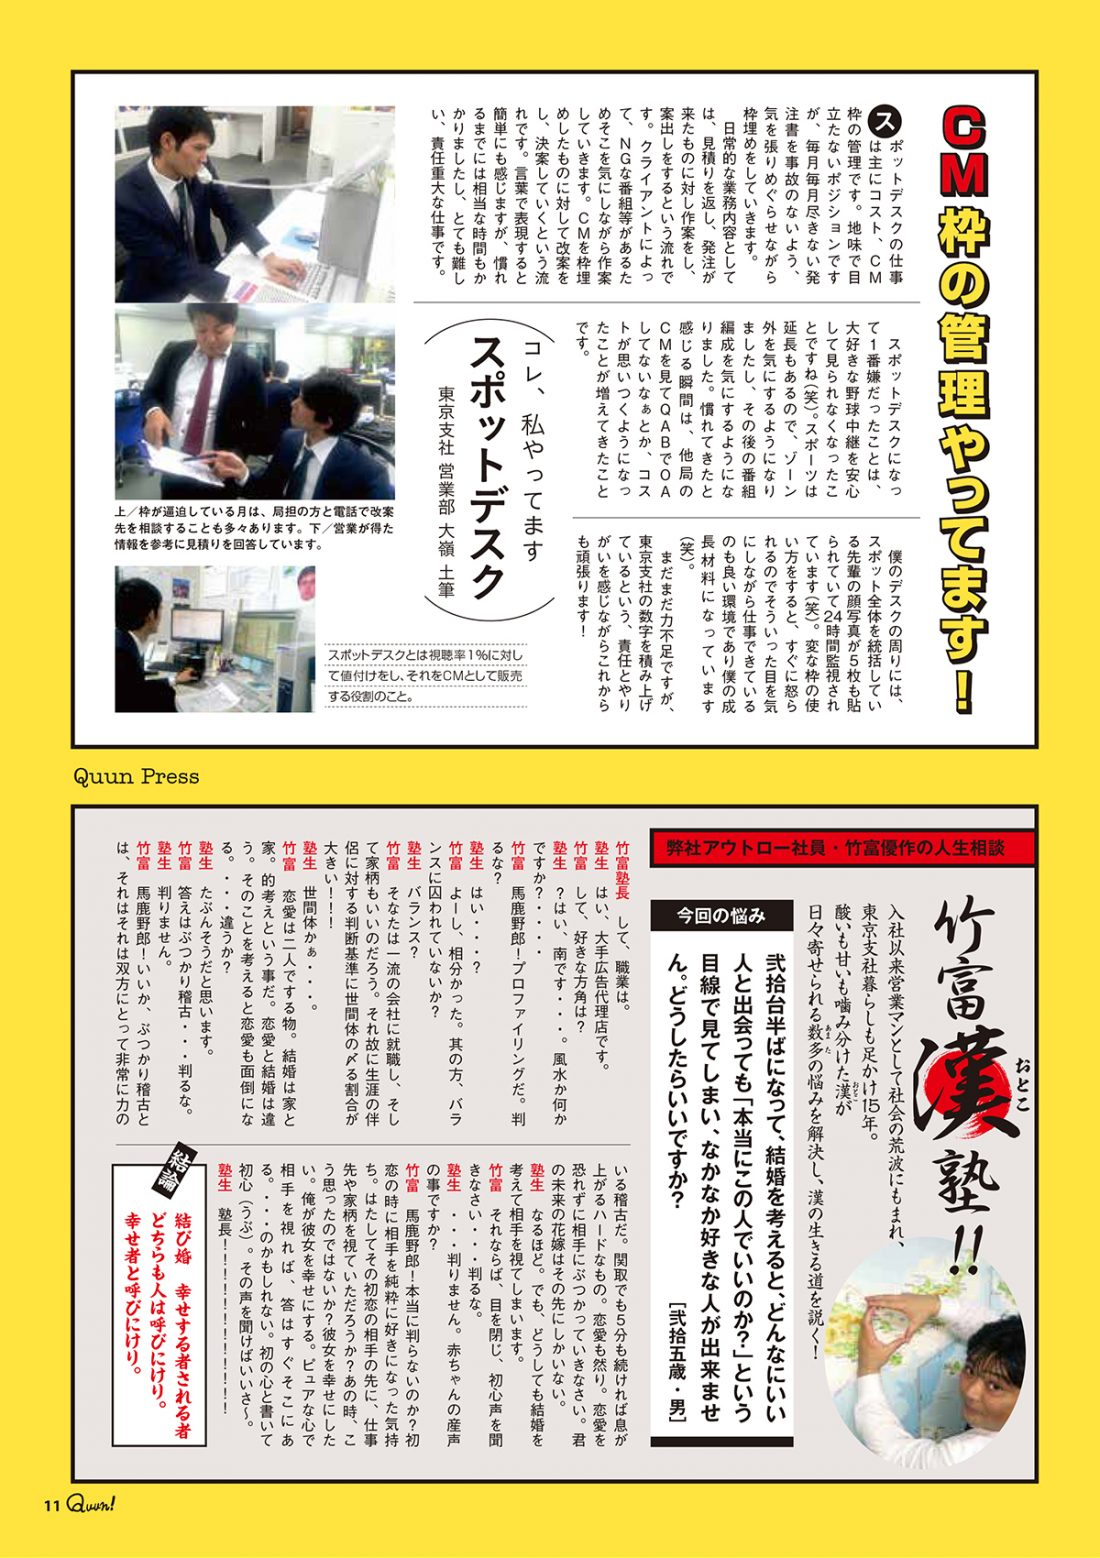 http://www.qab.co.jp/qgoro/wp-content/uploads/quun_0713-1100x1558.jpg